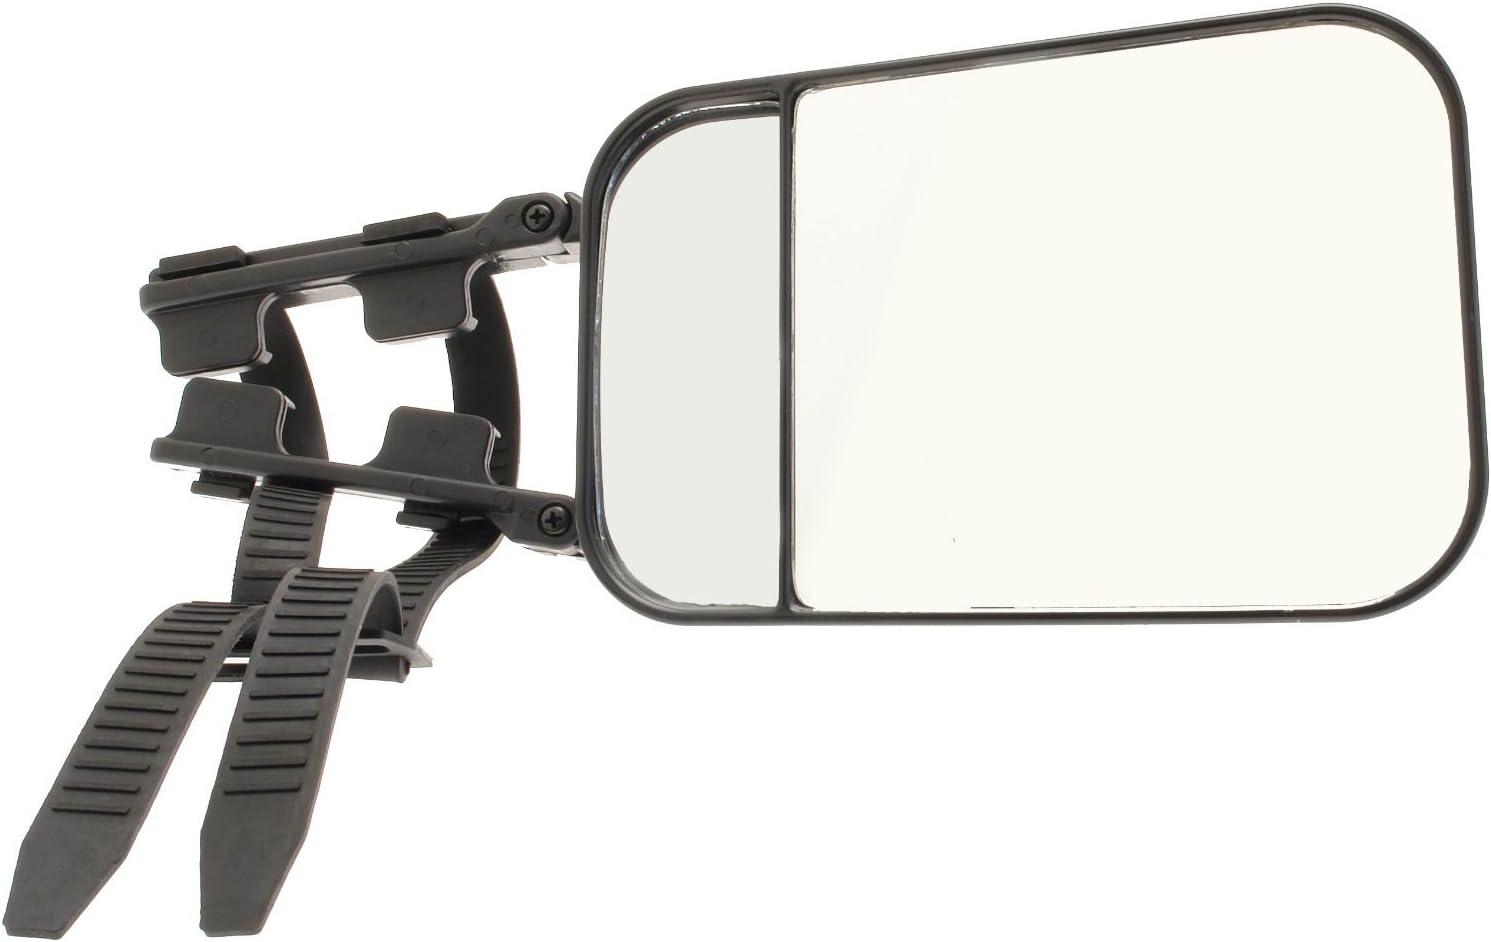 Seat Altea Caravan Trailer Robust Extension Towing Wing Mirror Glass Pair